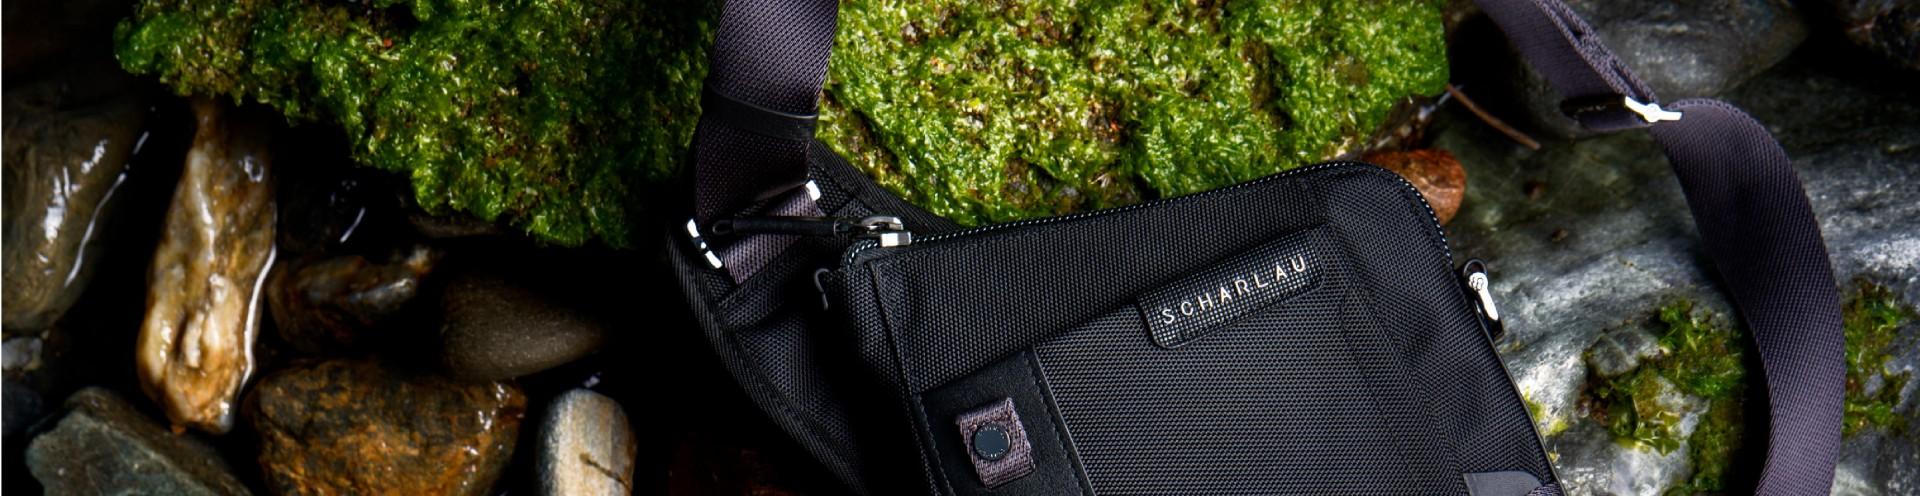 Men's Customizable Crossbody Bags